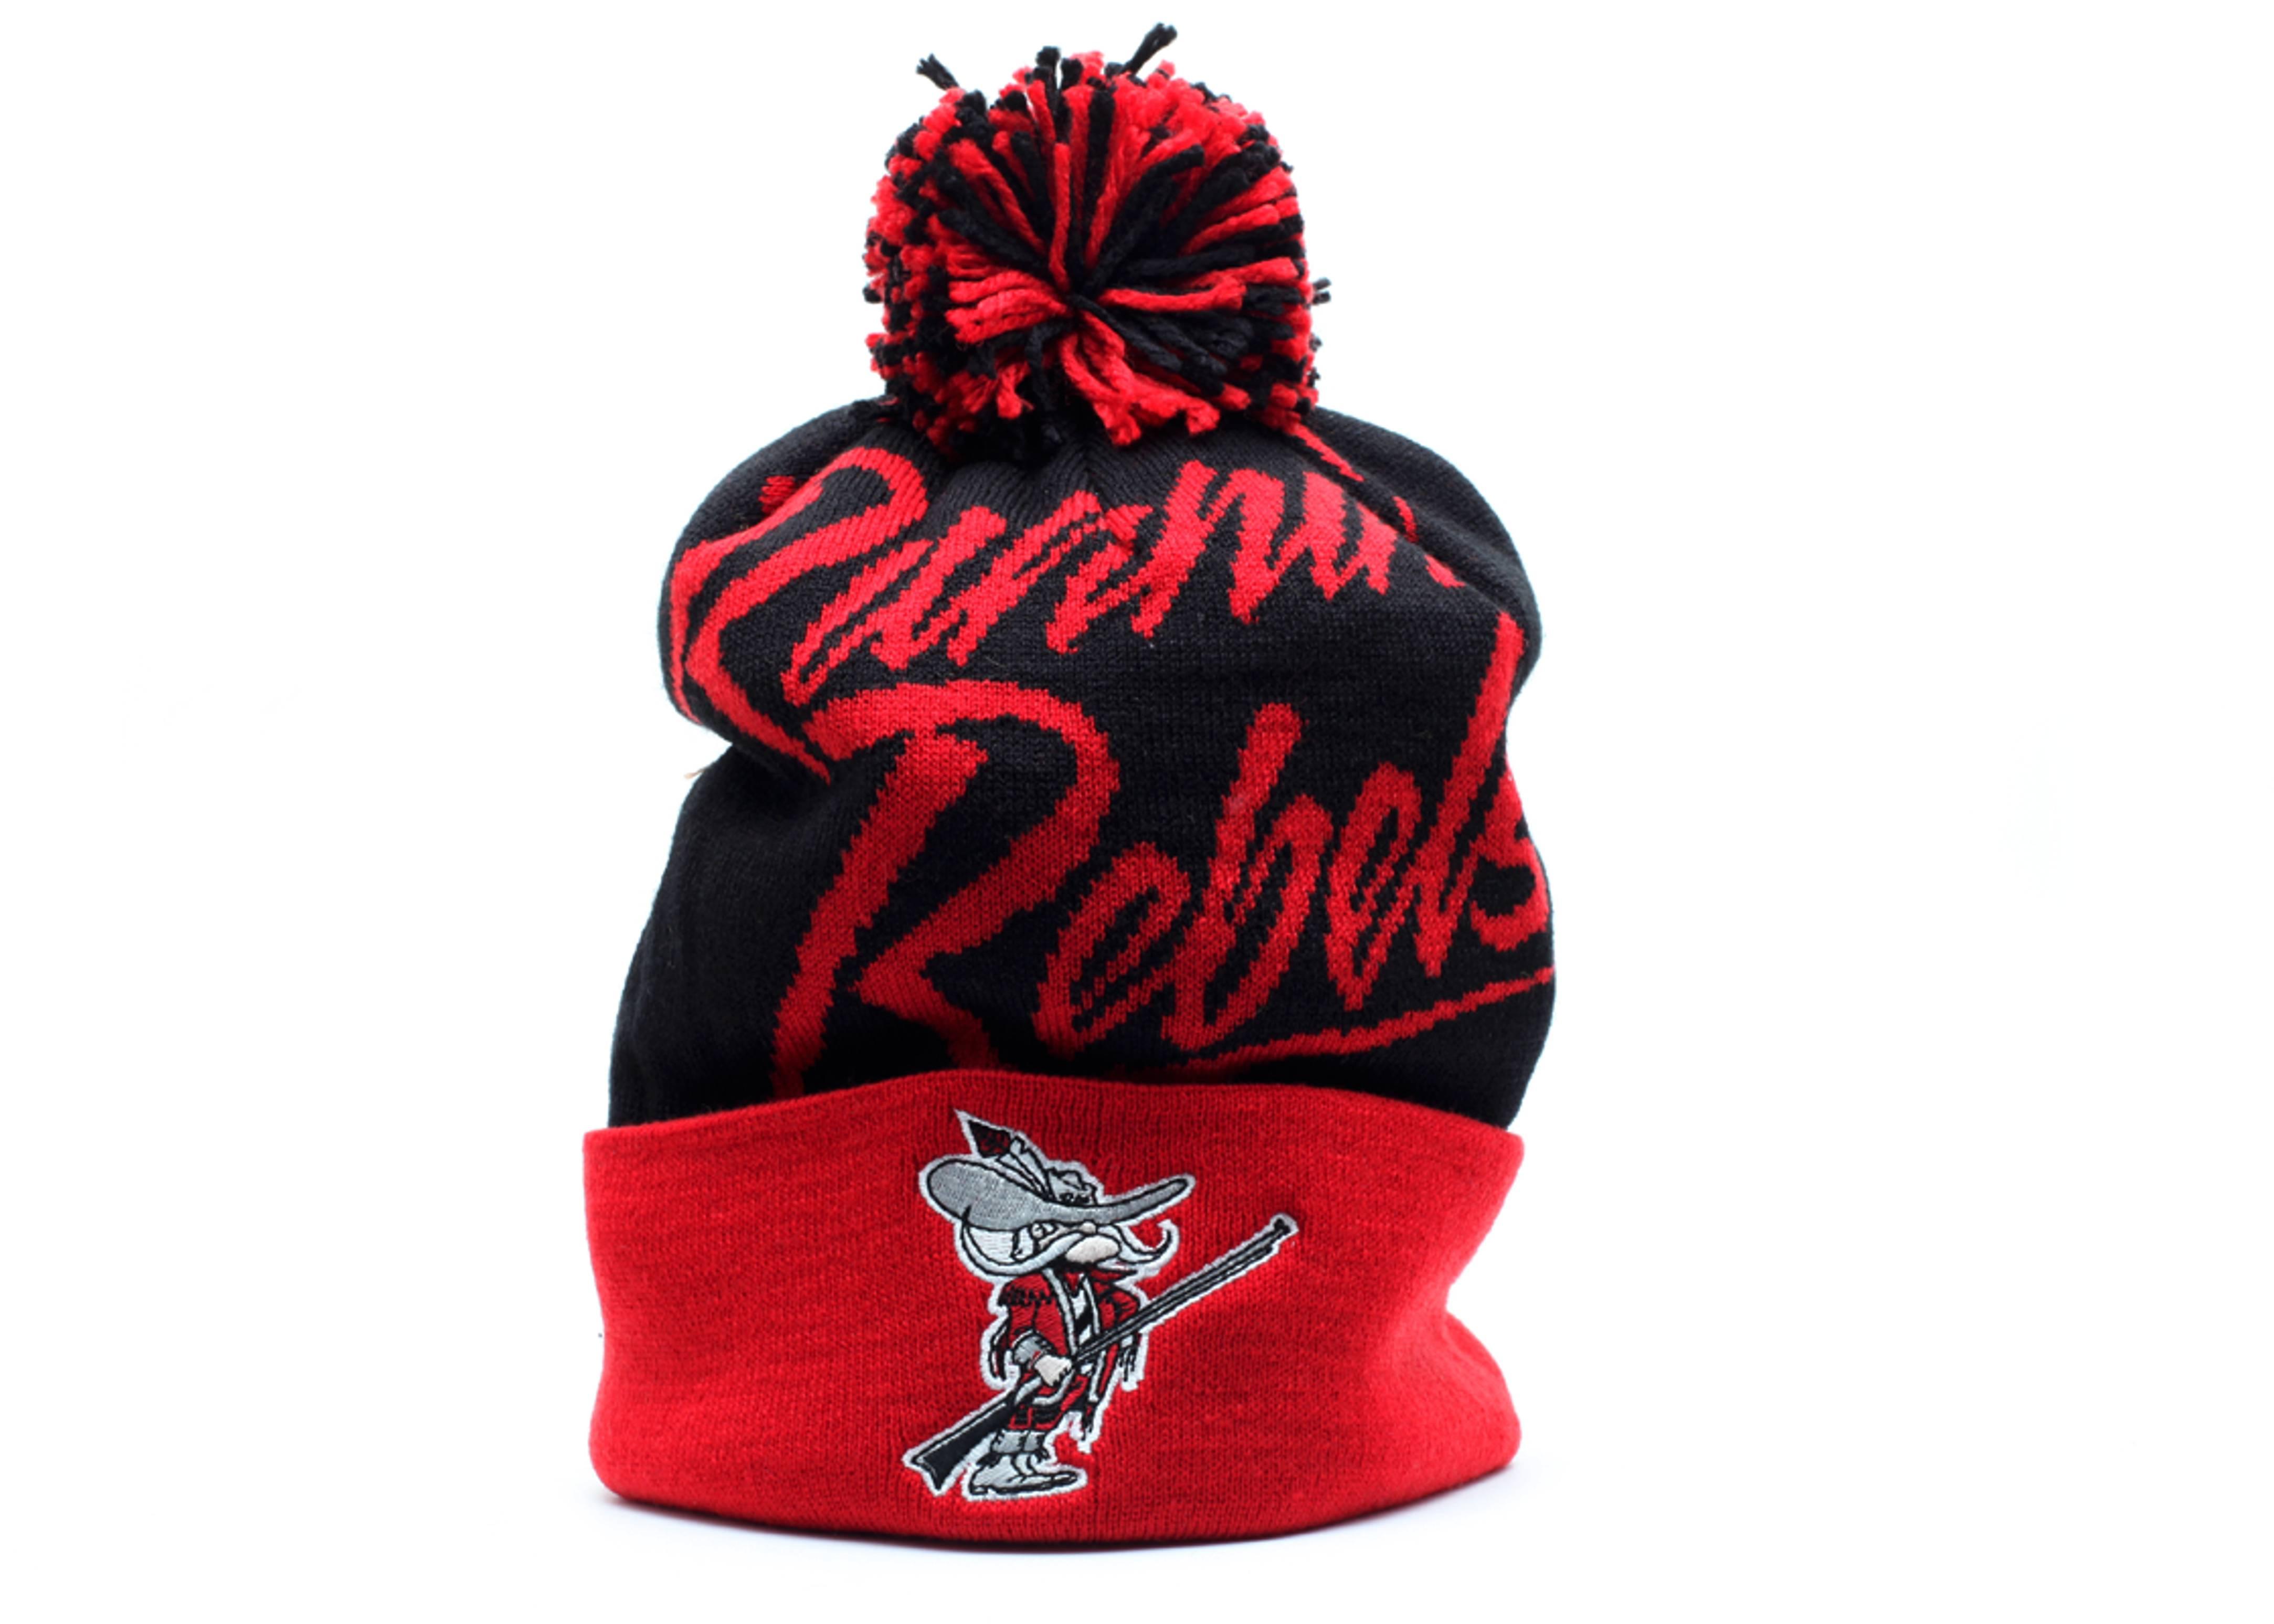 unlv rebels cuffed pom knit beanie red/black